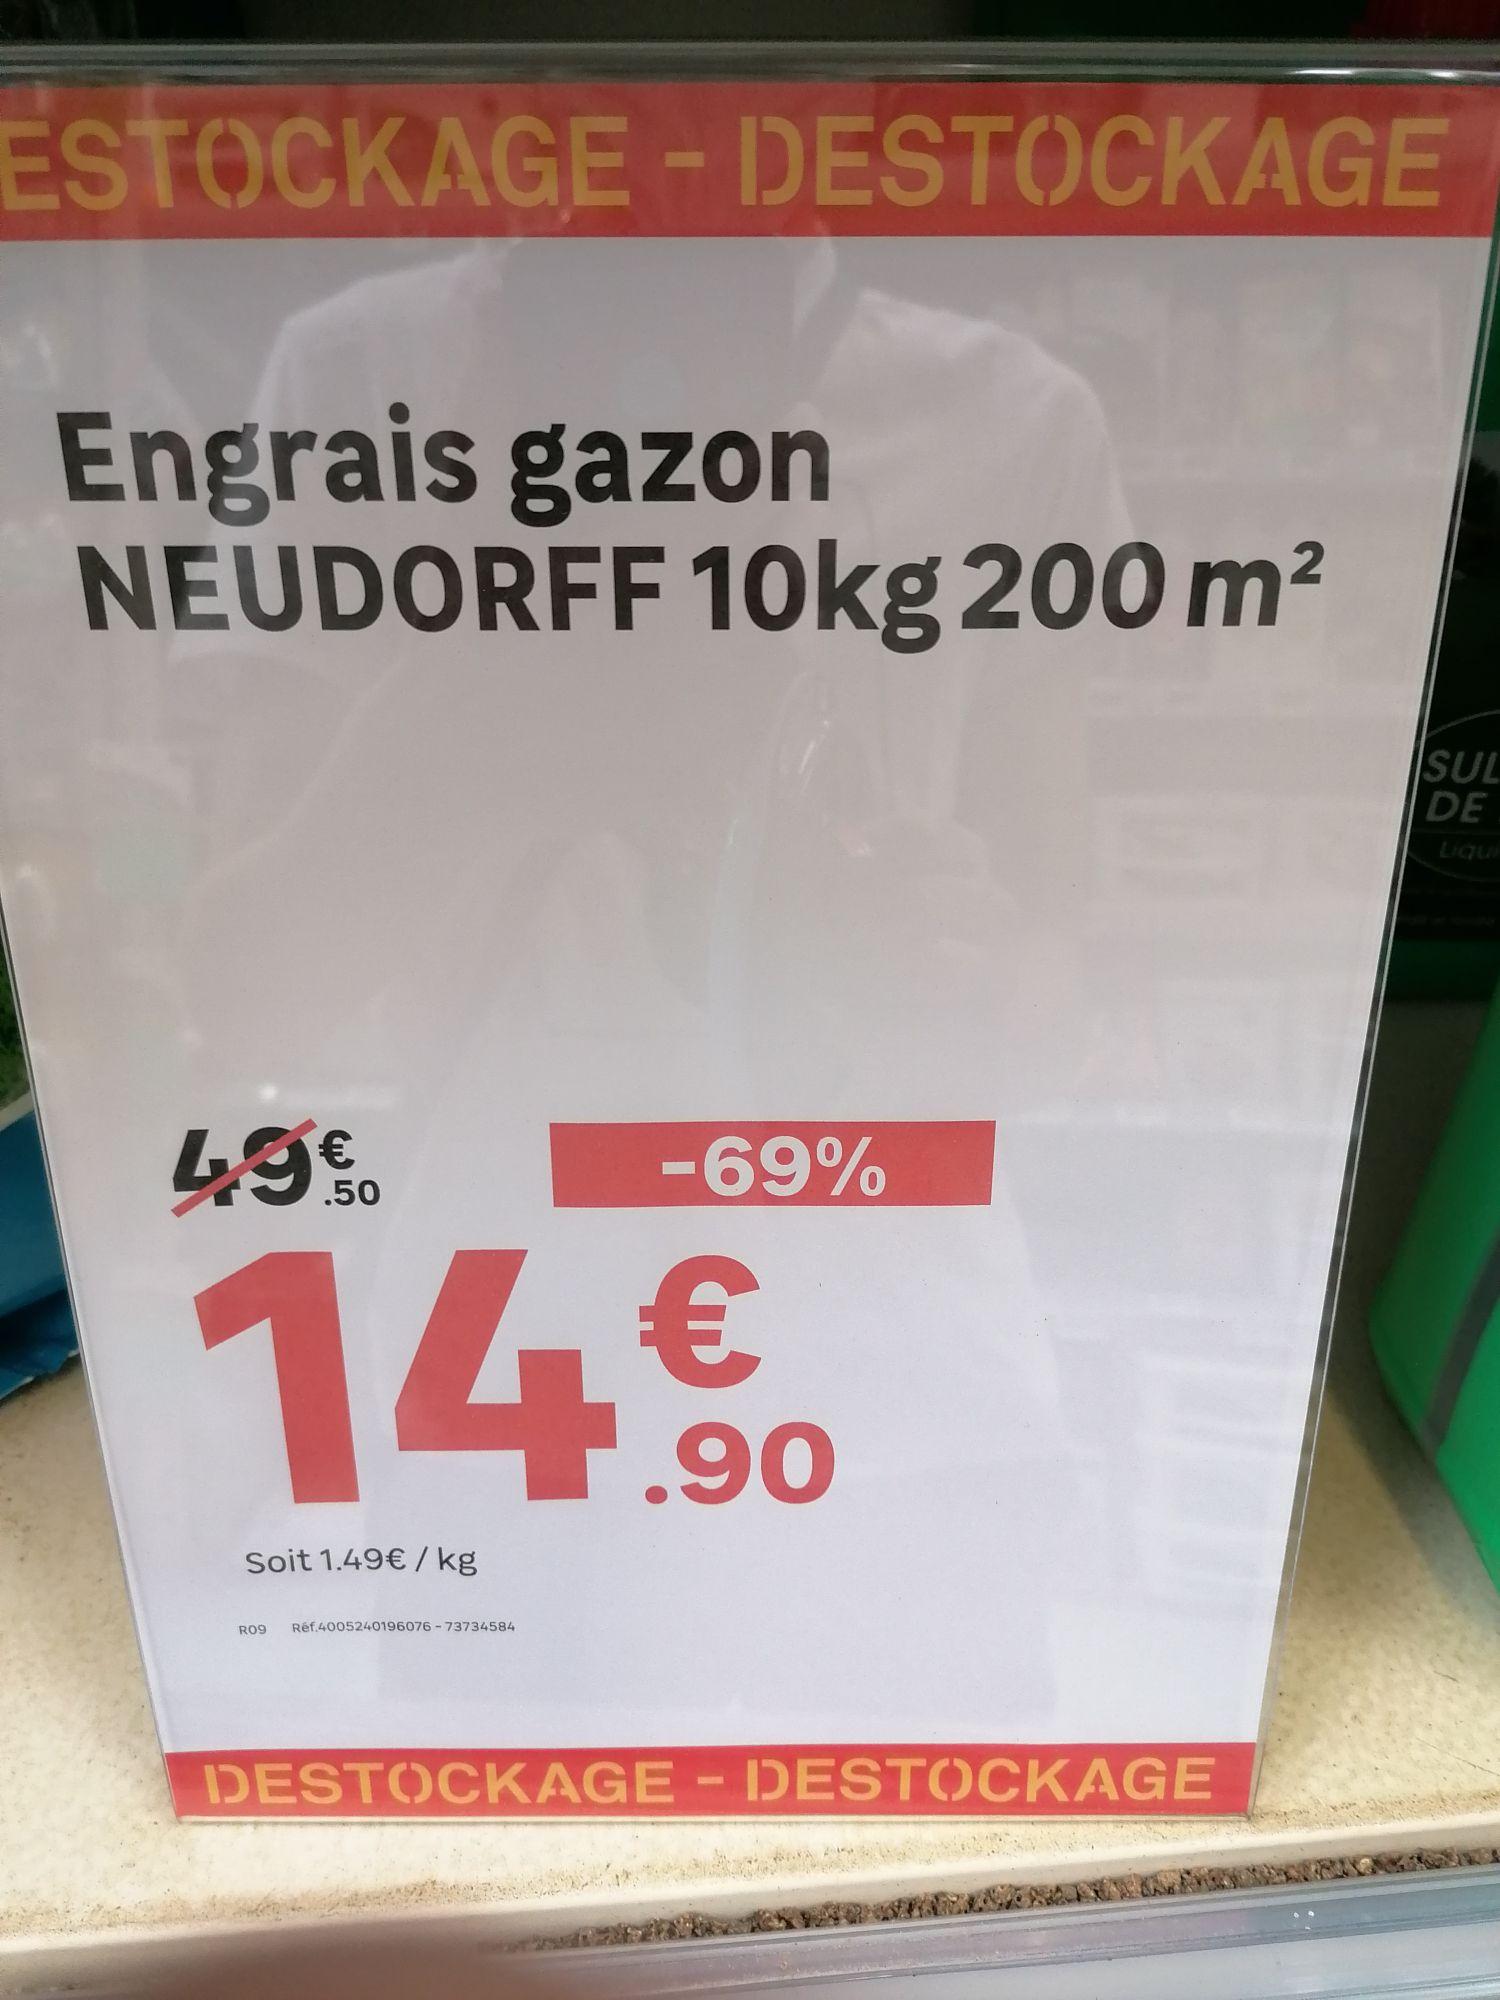 Engrais gazon Neudorff - 10Kg - Hautmont (59)